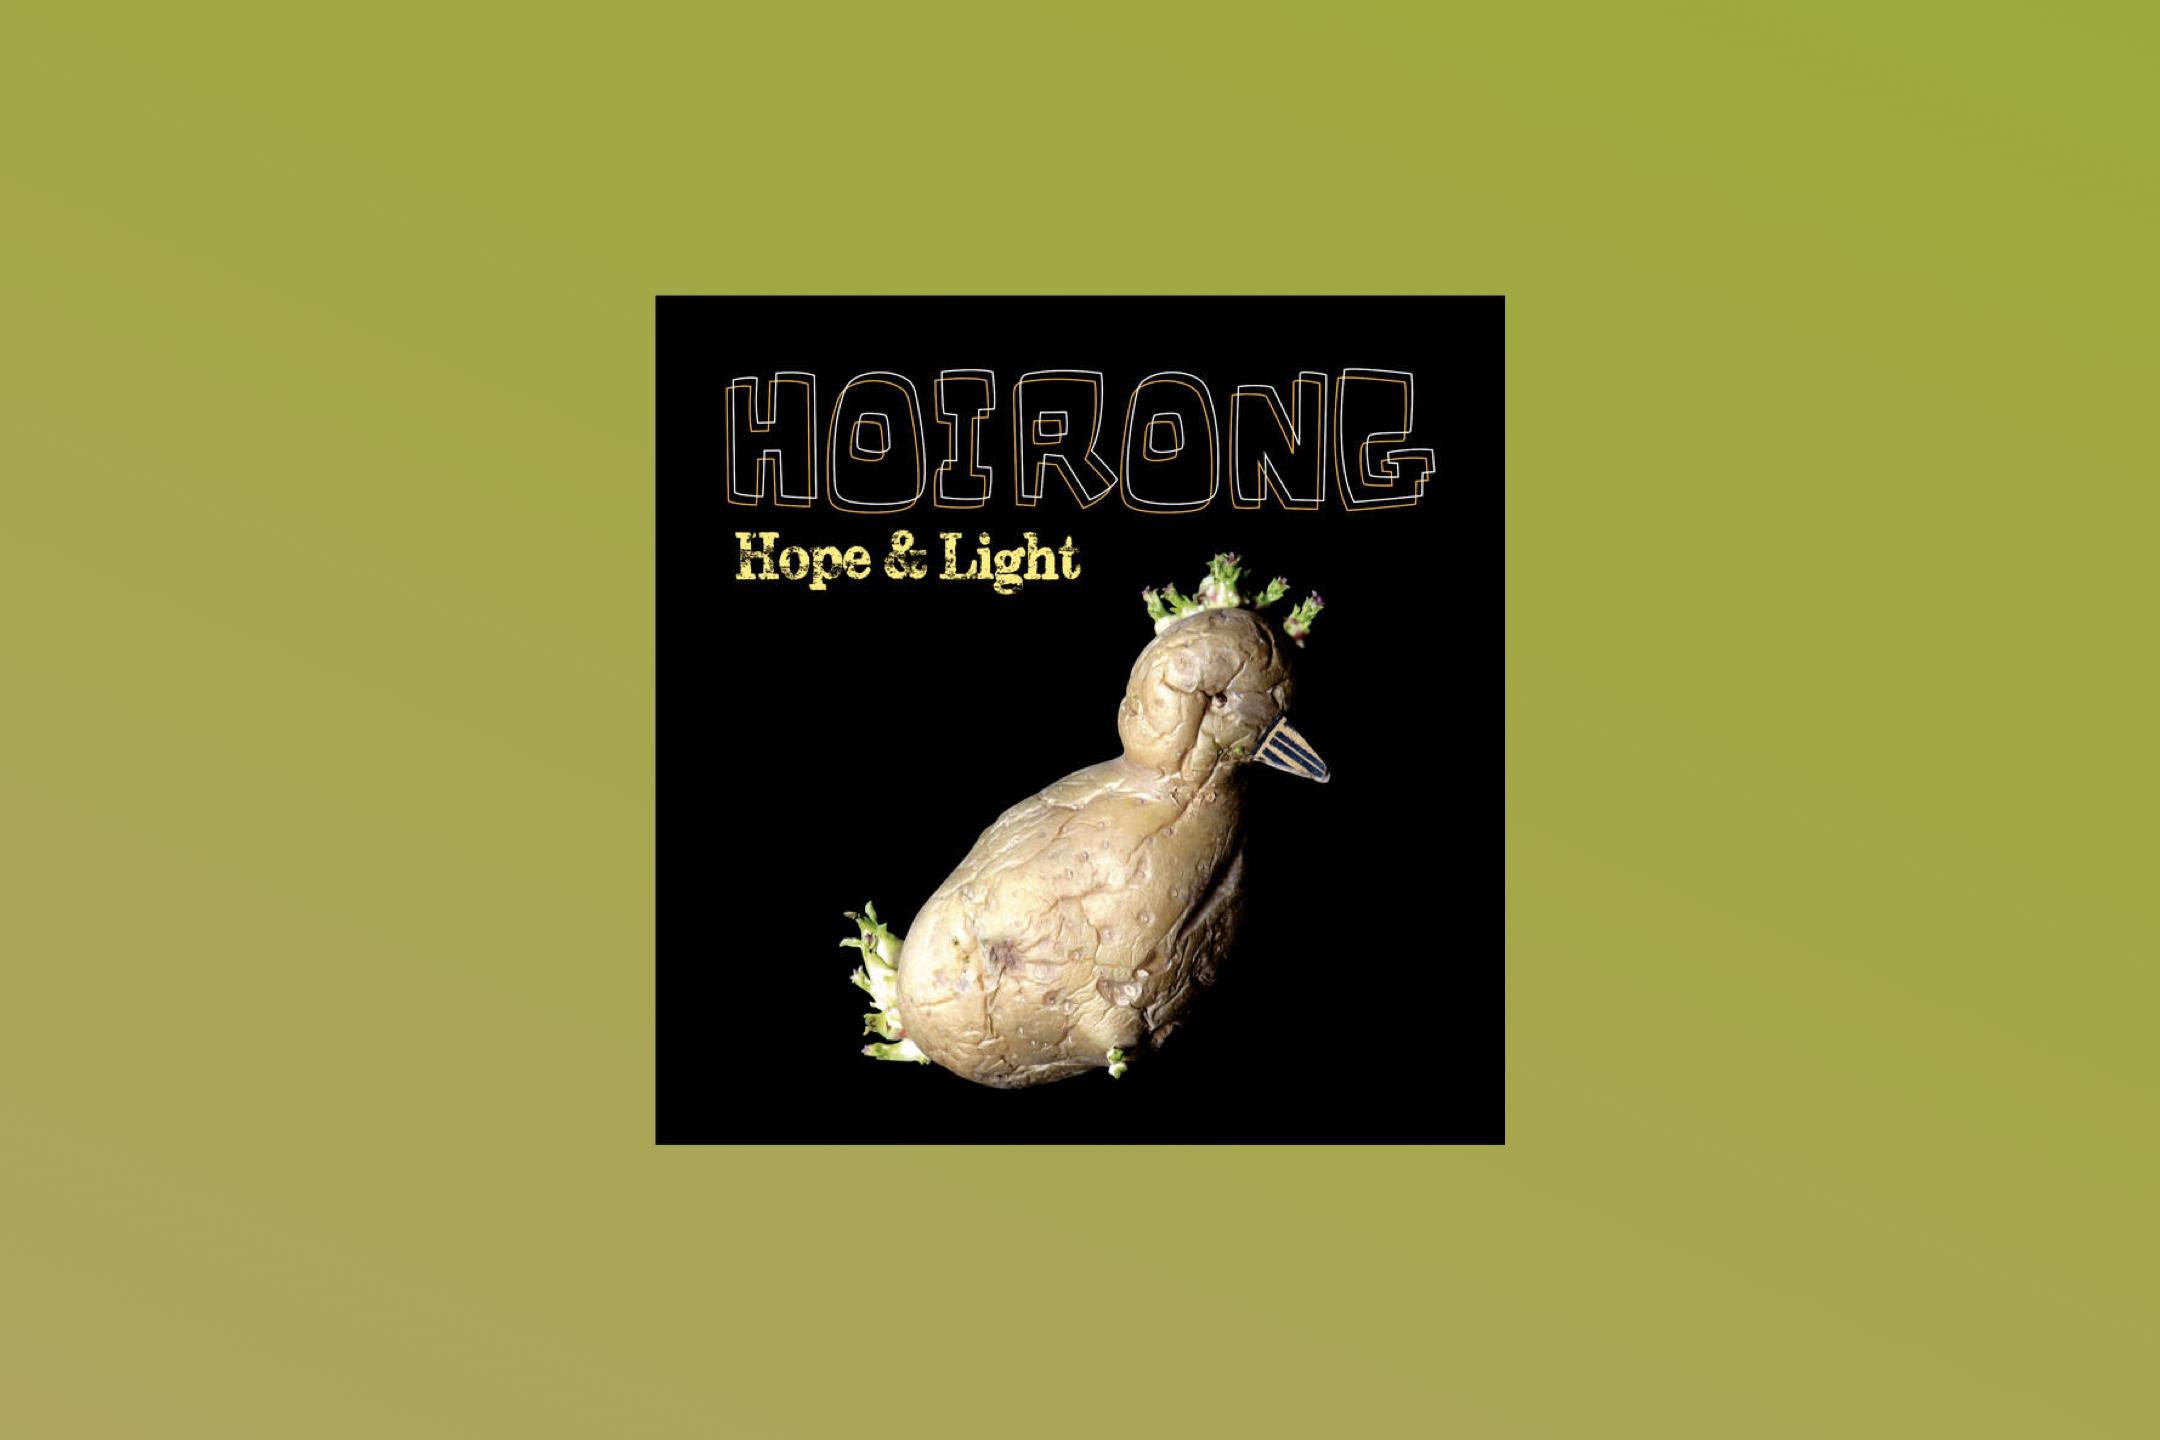 Hoirong Hope & Light